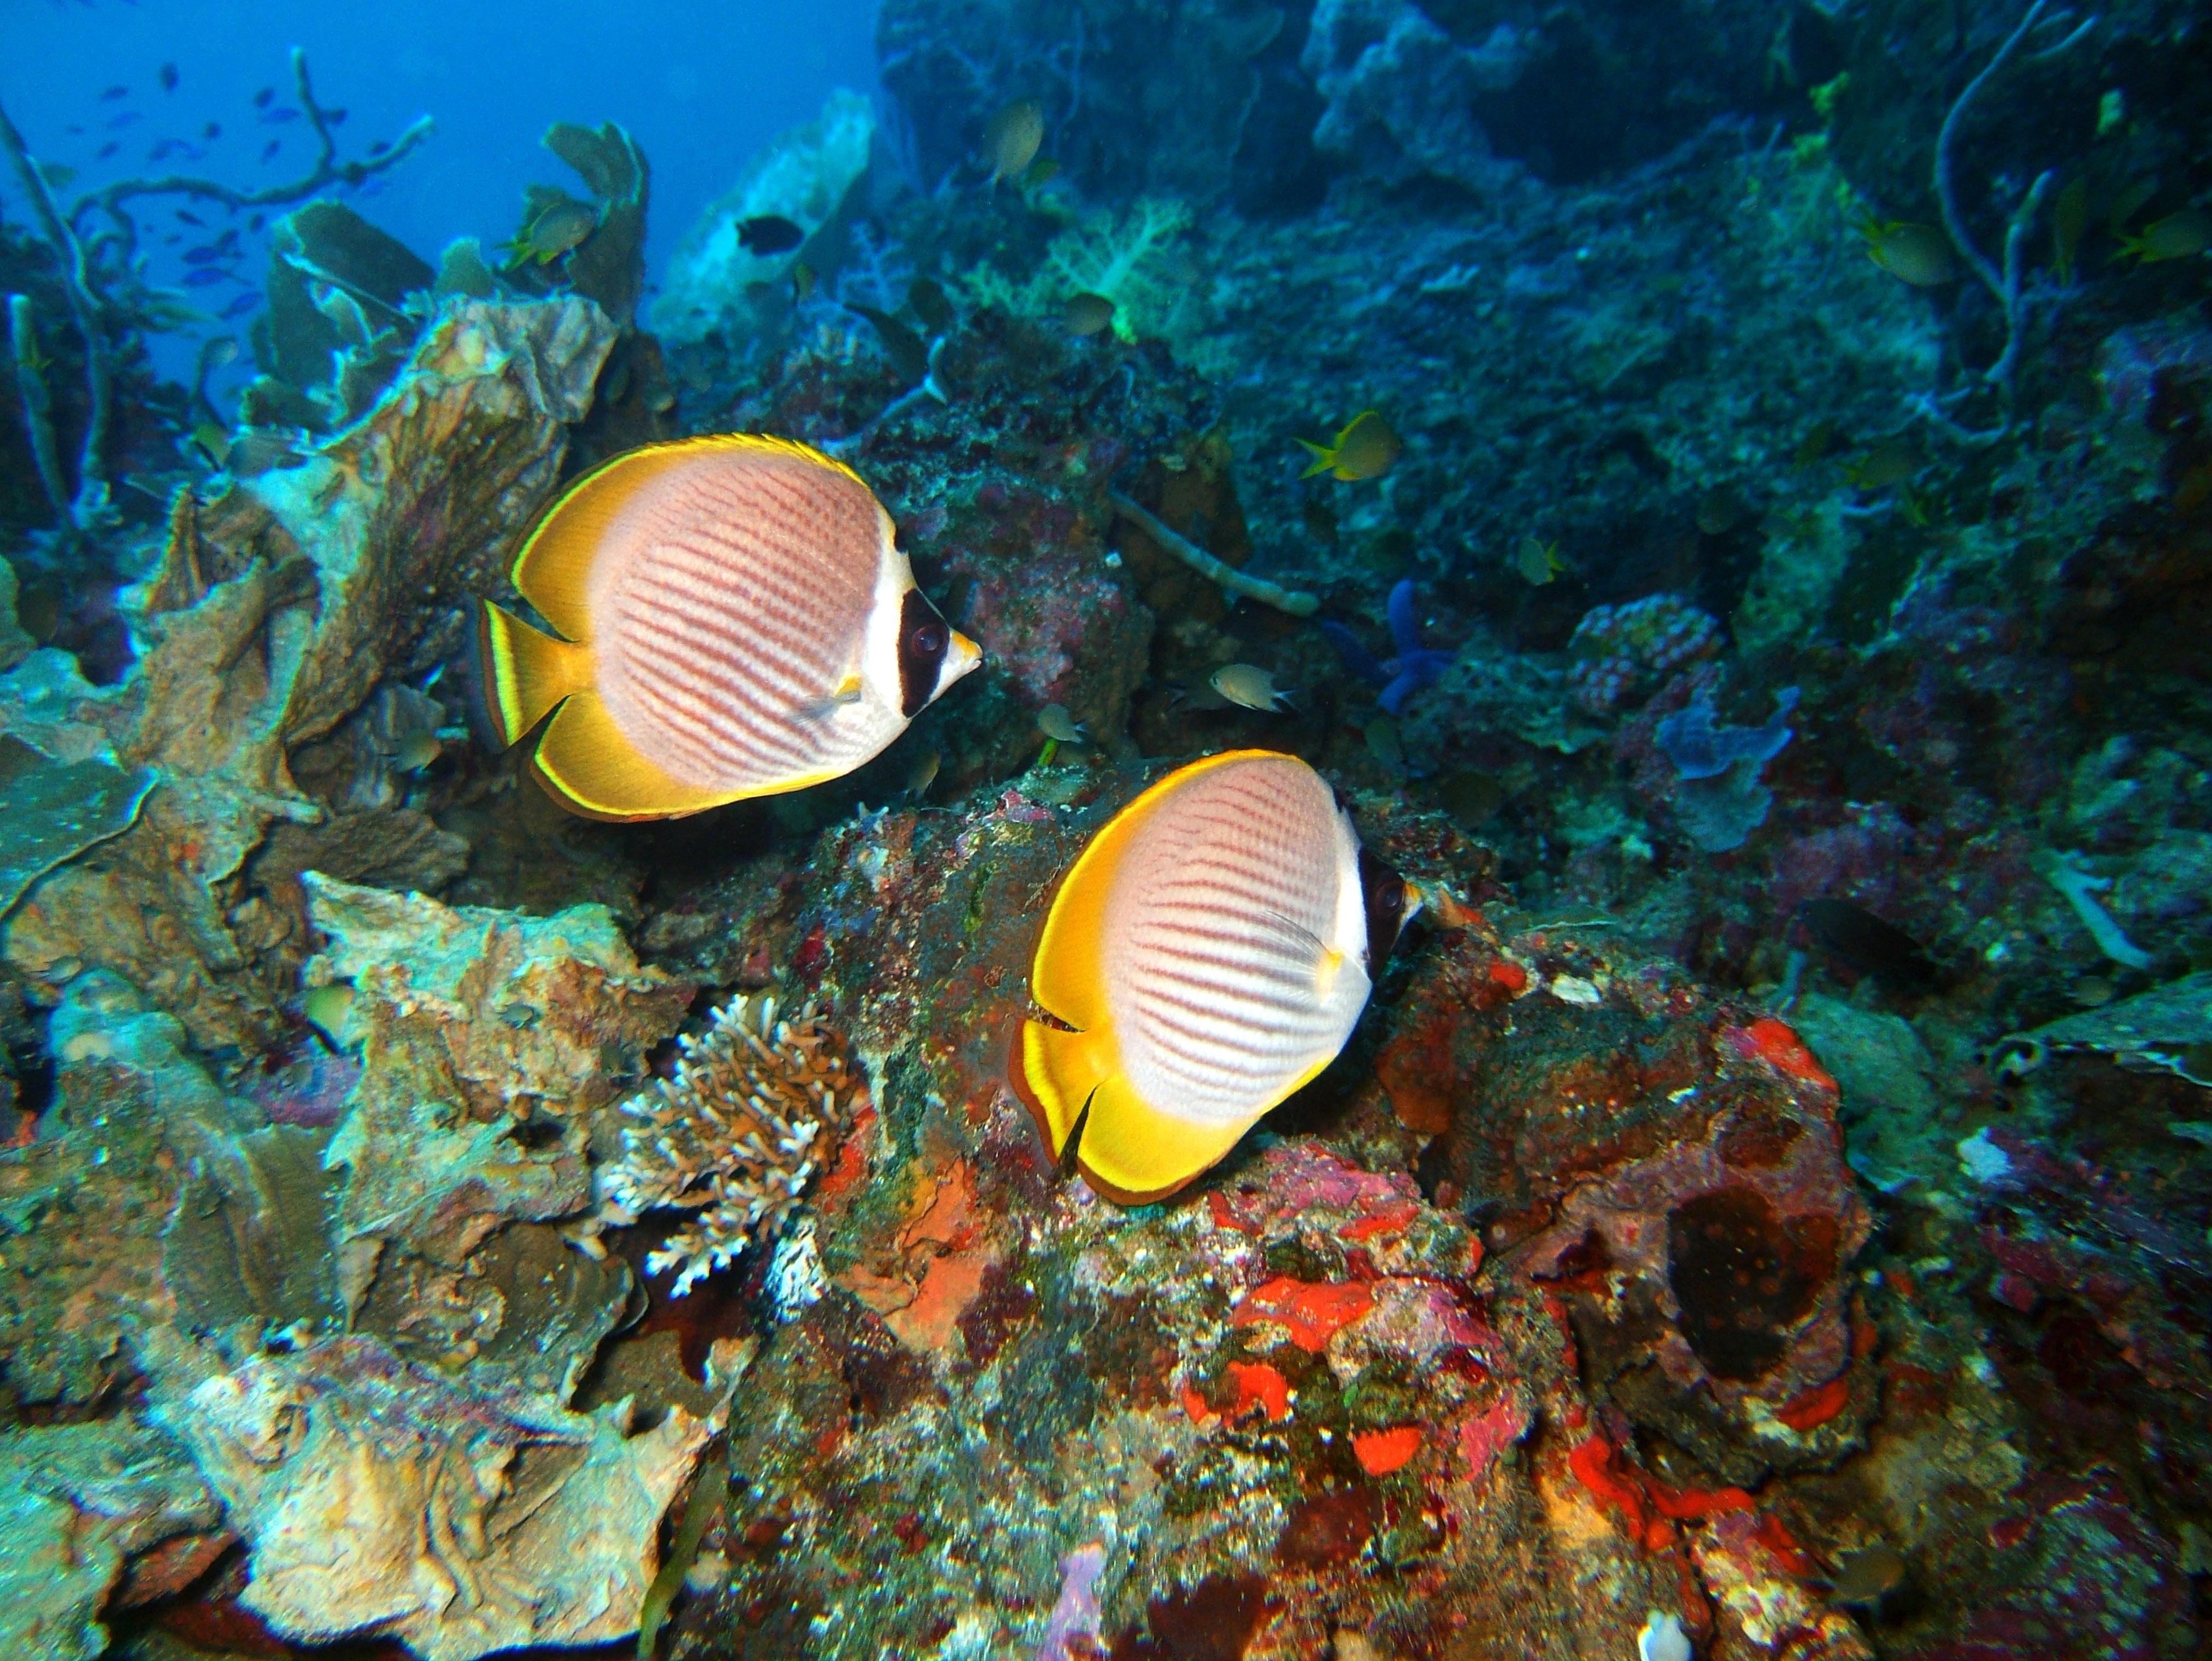 Philippines Cebu Moal Boal 20051227 Dive 1 Pescador Island 17